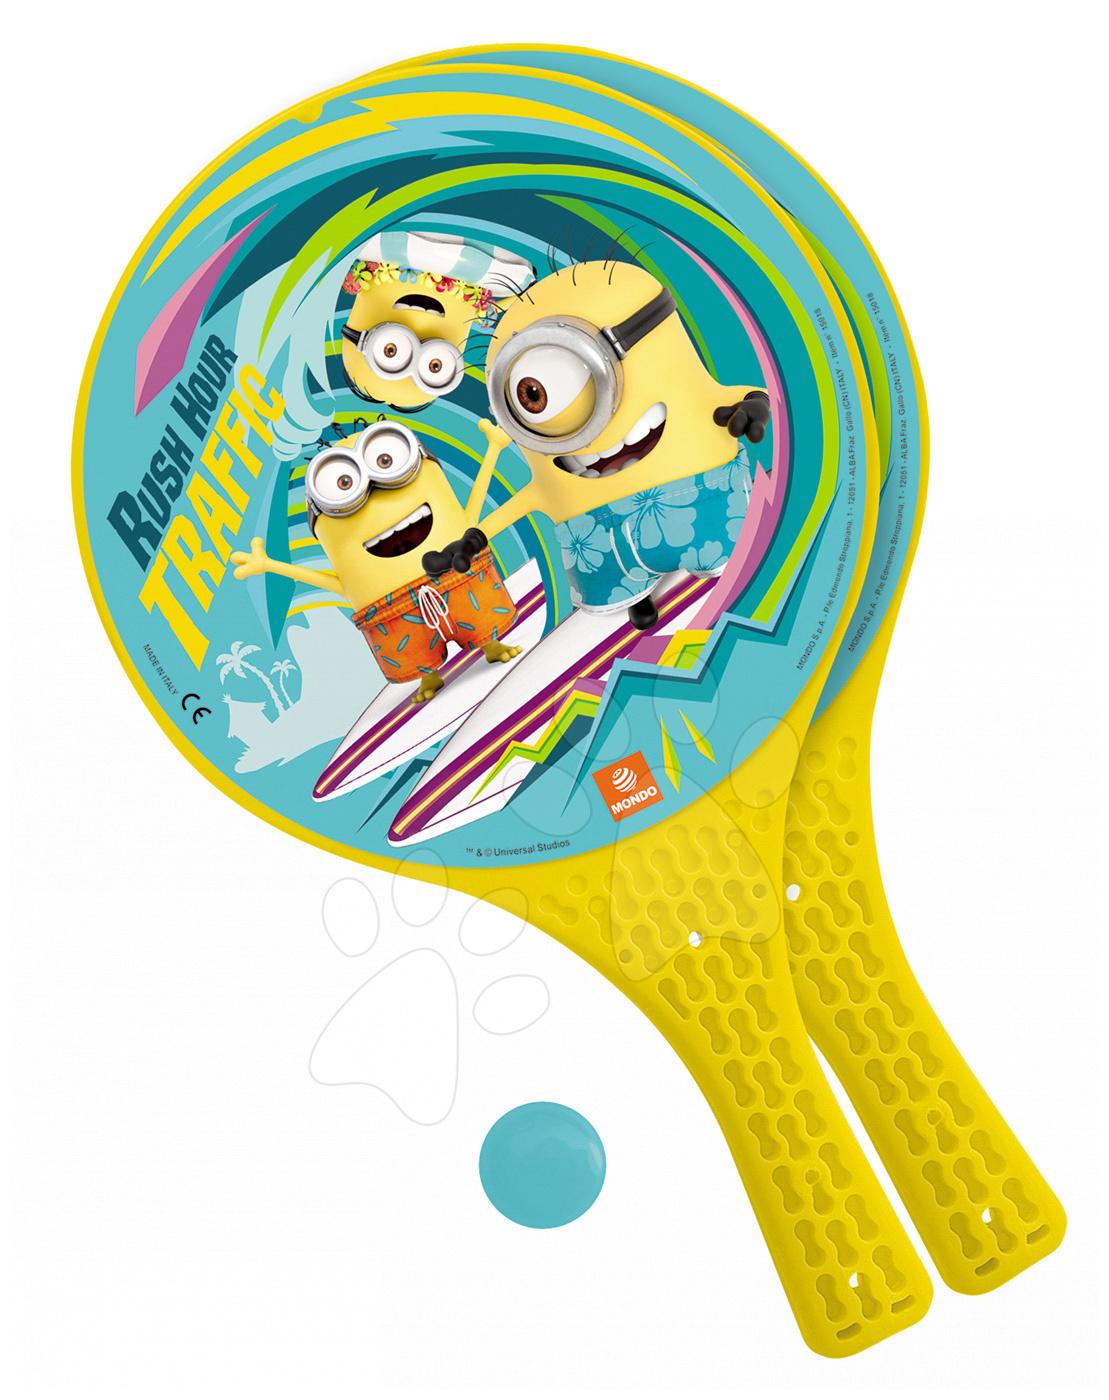 Tenis - Plážový tenis Mimoni Mondo s 2 raketami a loptičkou